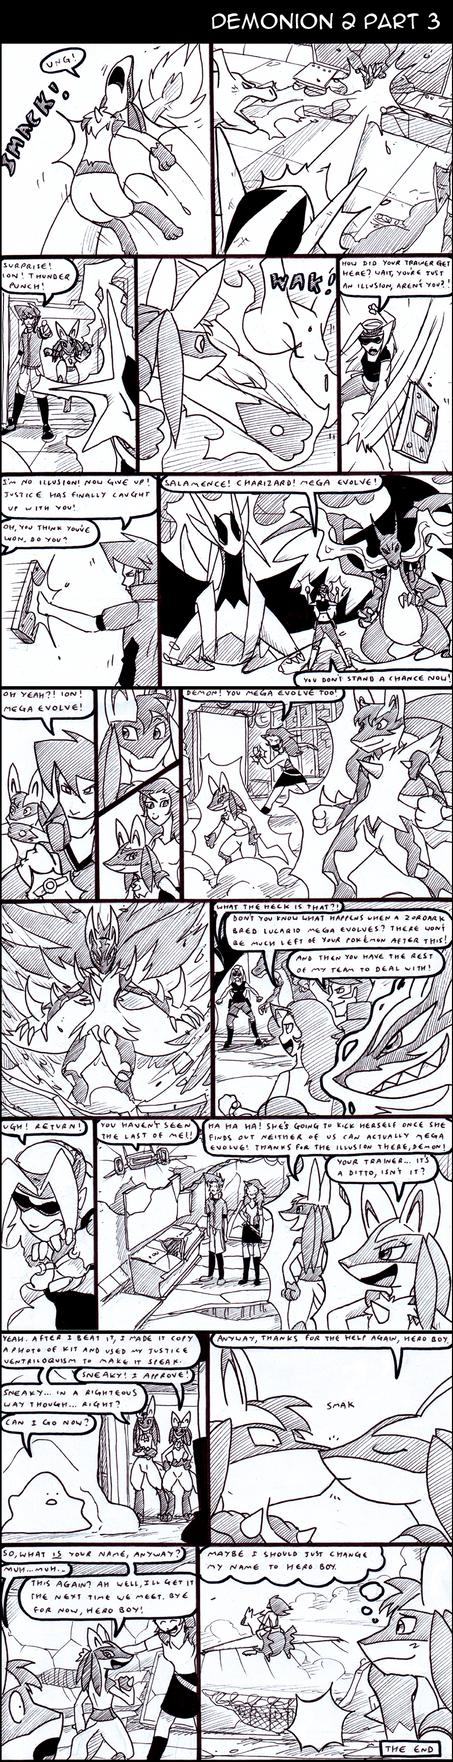 Demonion 2 Part 3 by kitfox-crimson